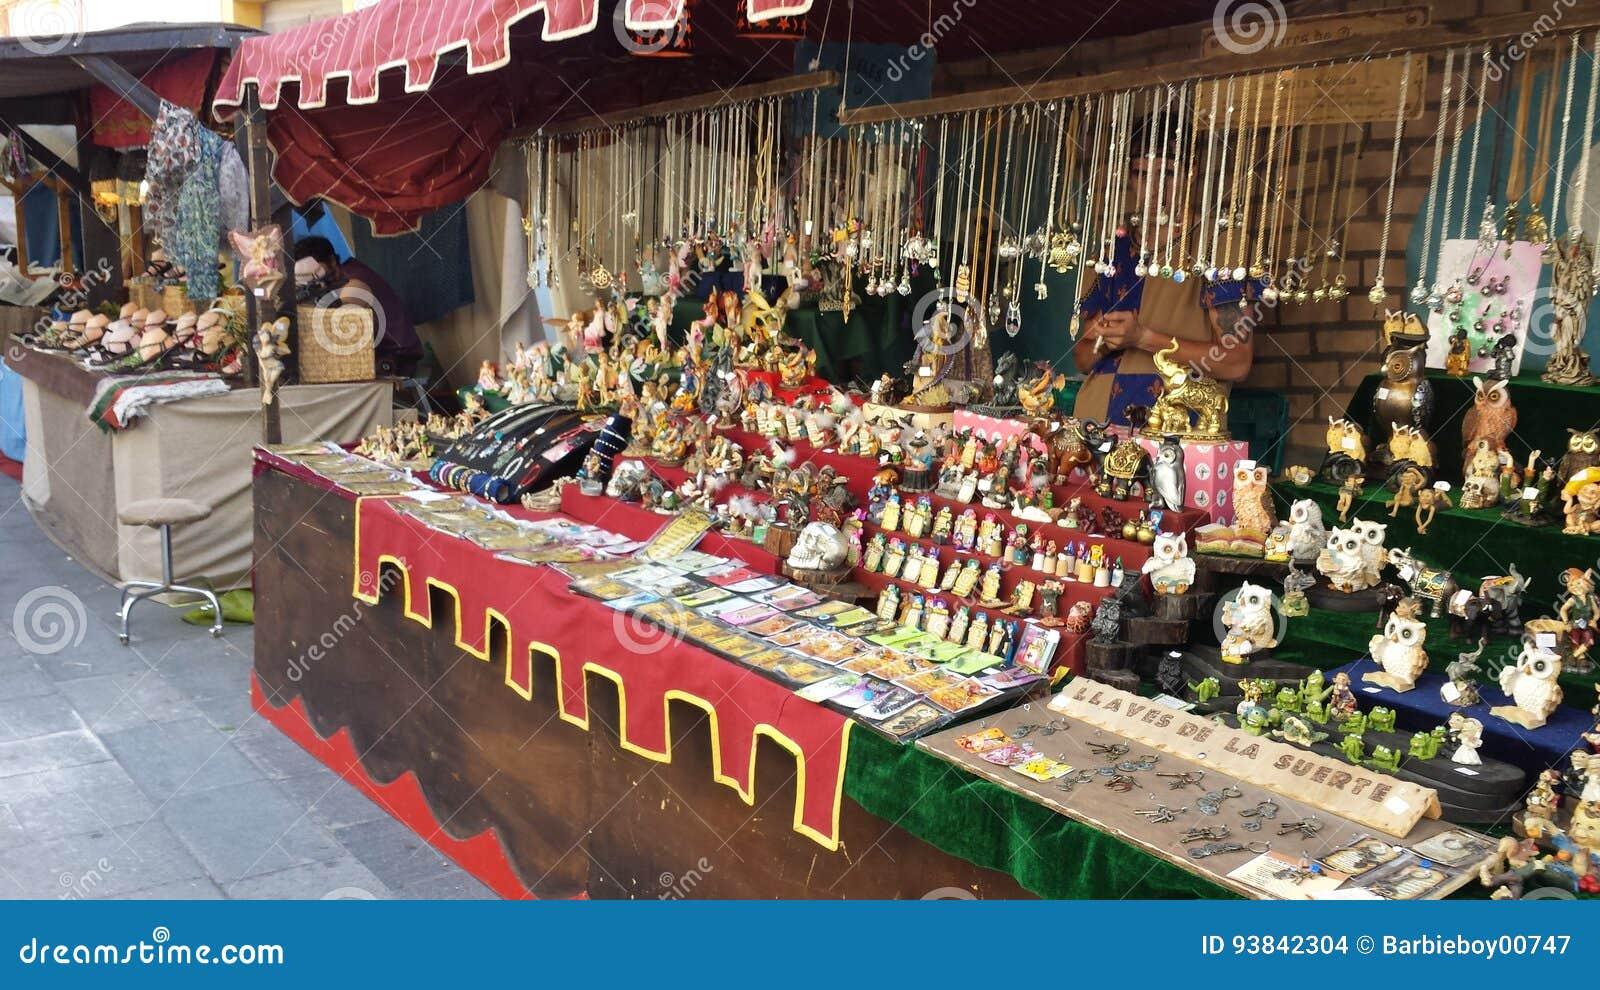 arab markets ibiza spain editorial stock image. image of catalan